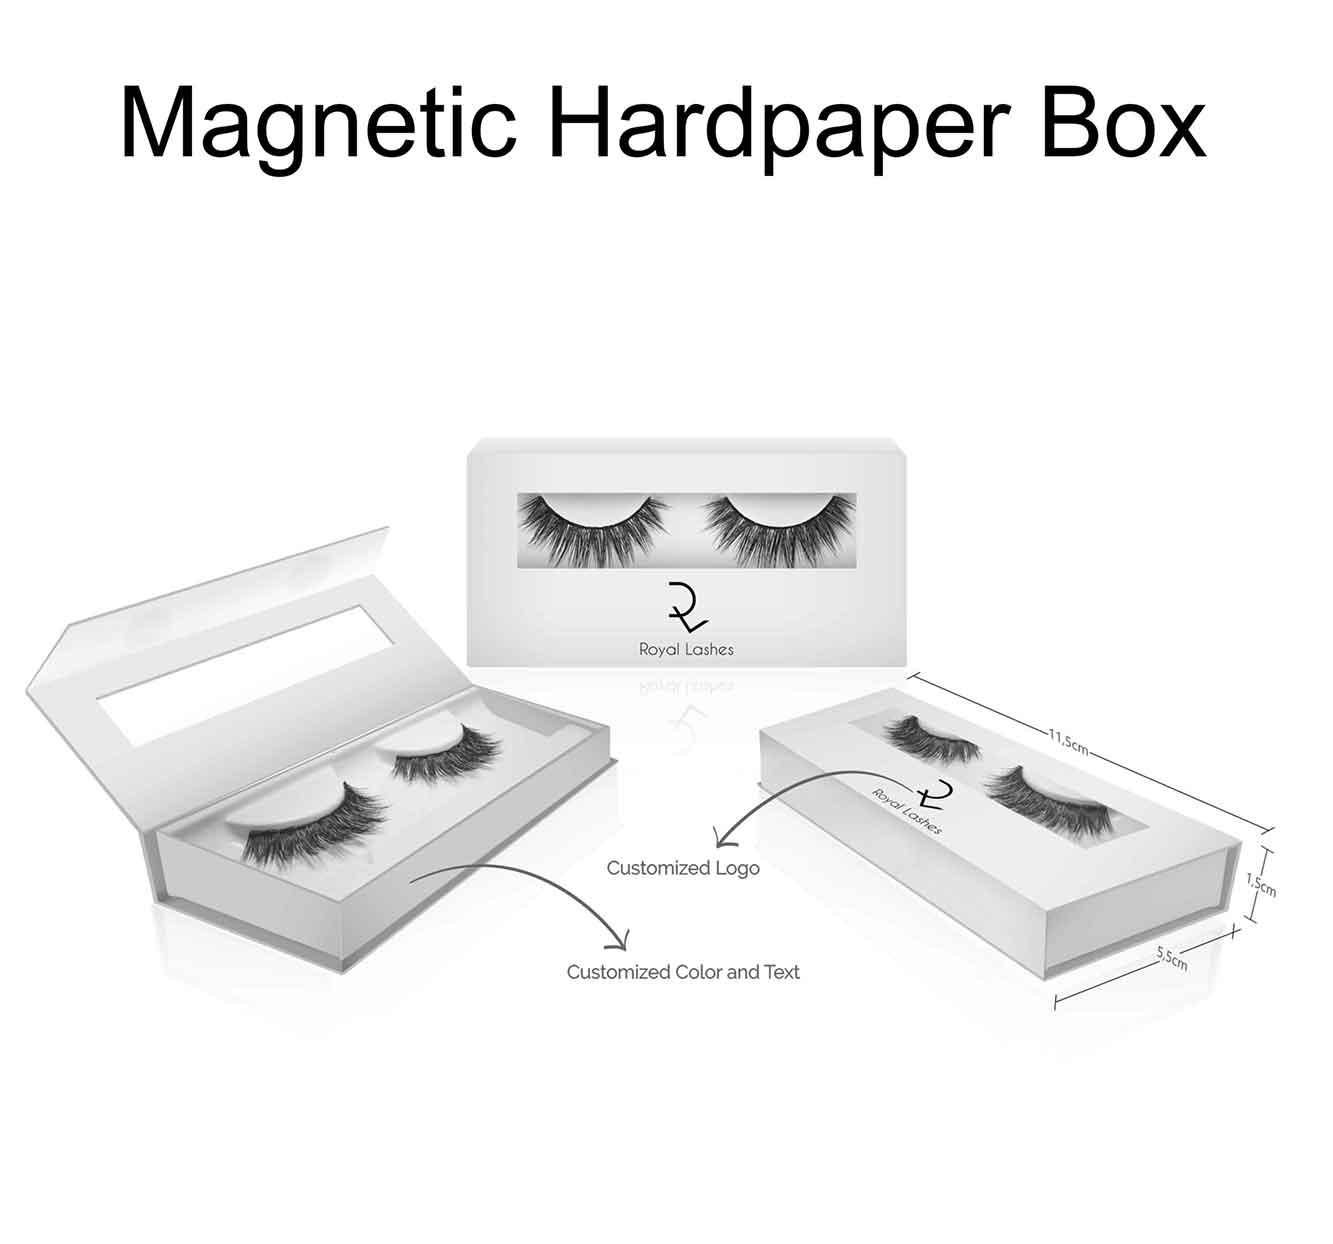 Magnetic-Hardpaper-Box